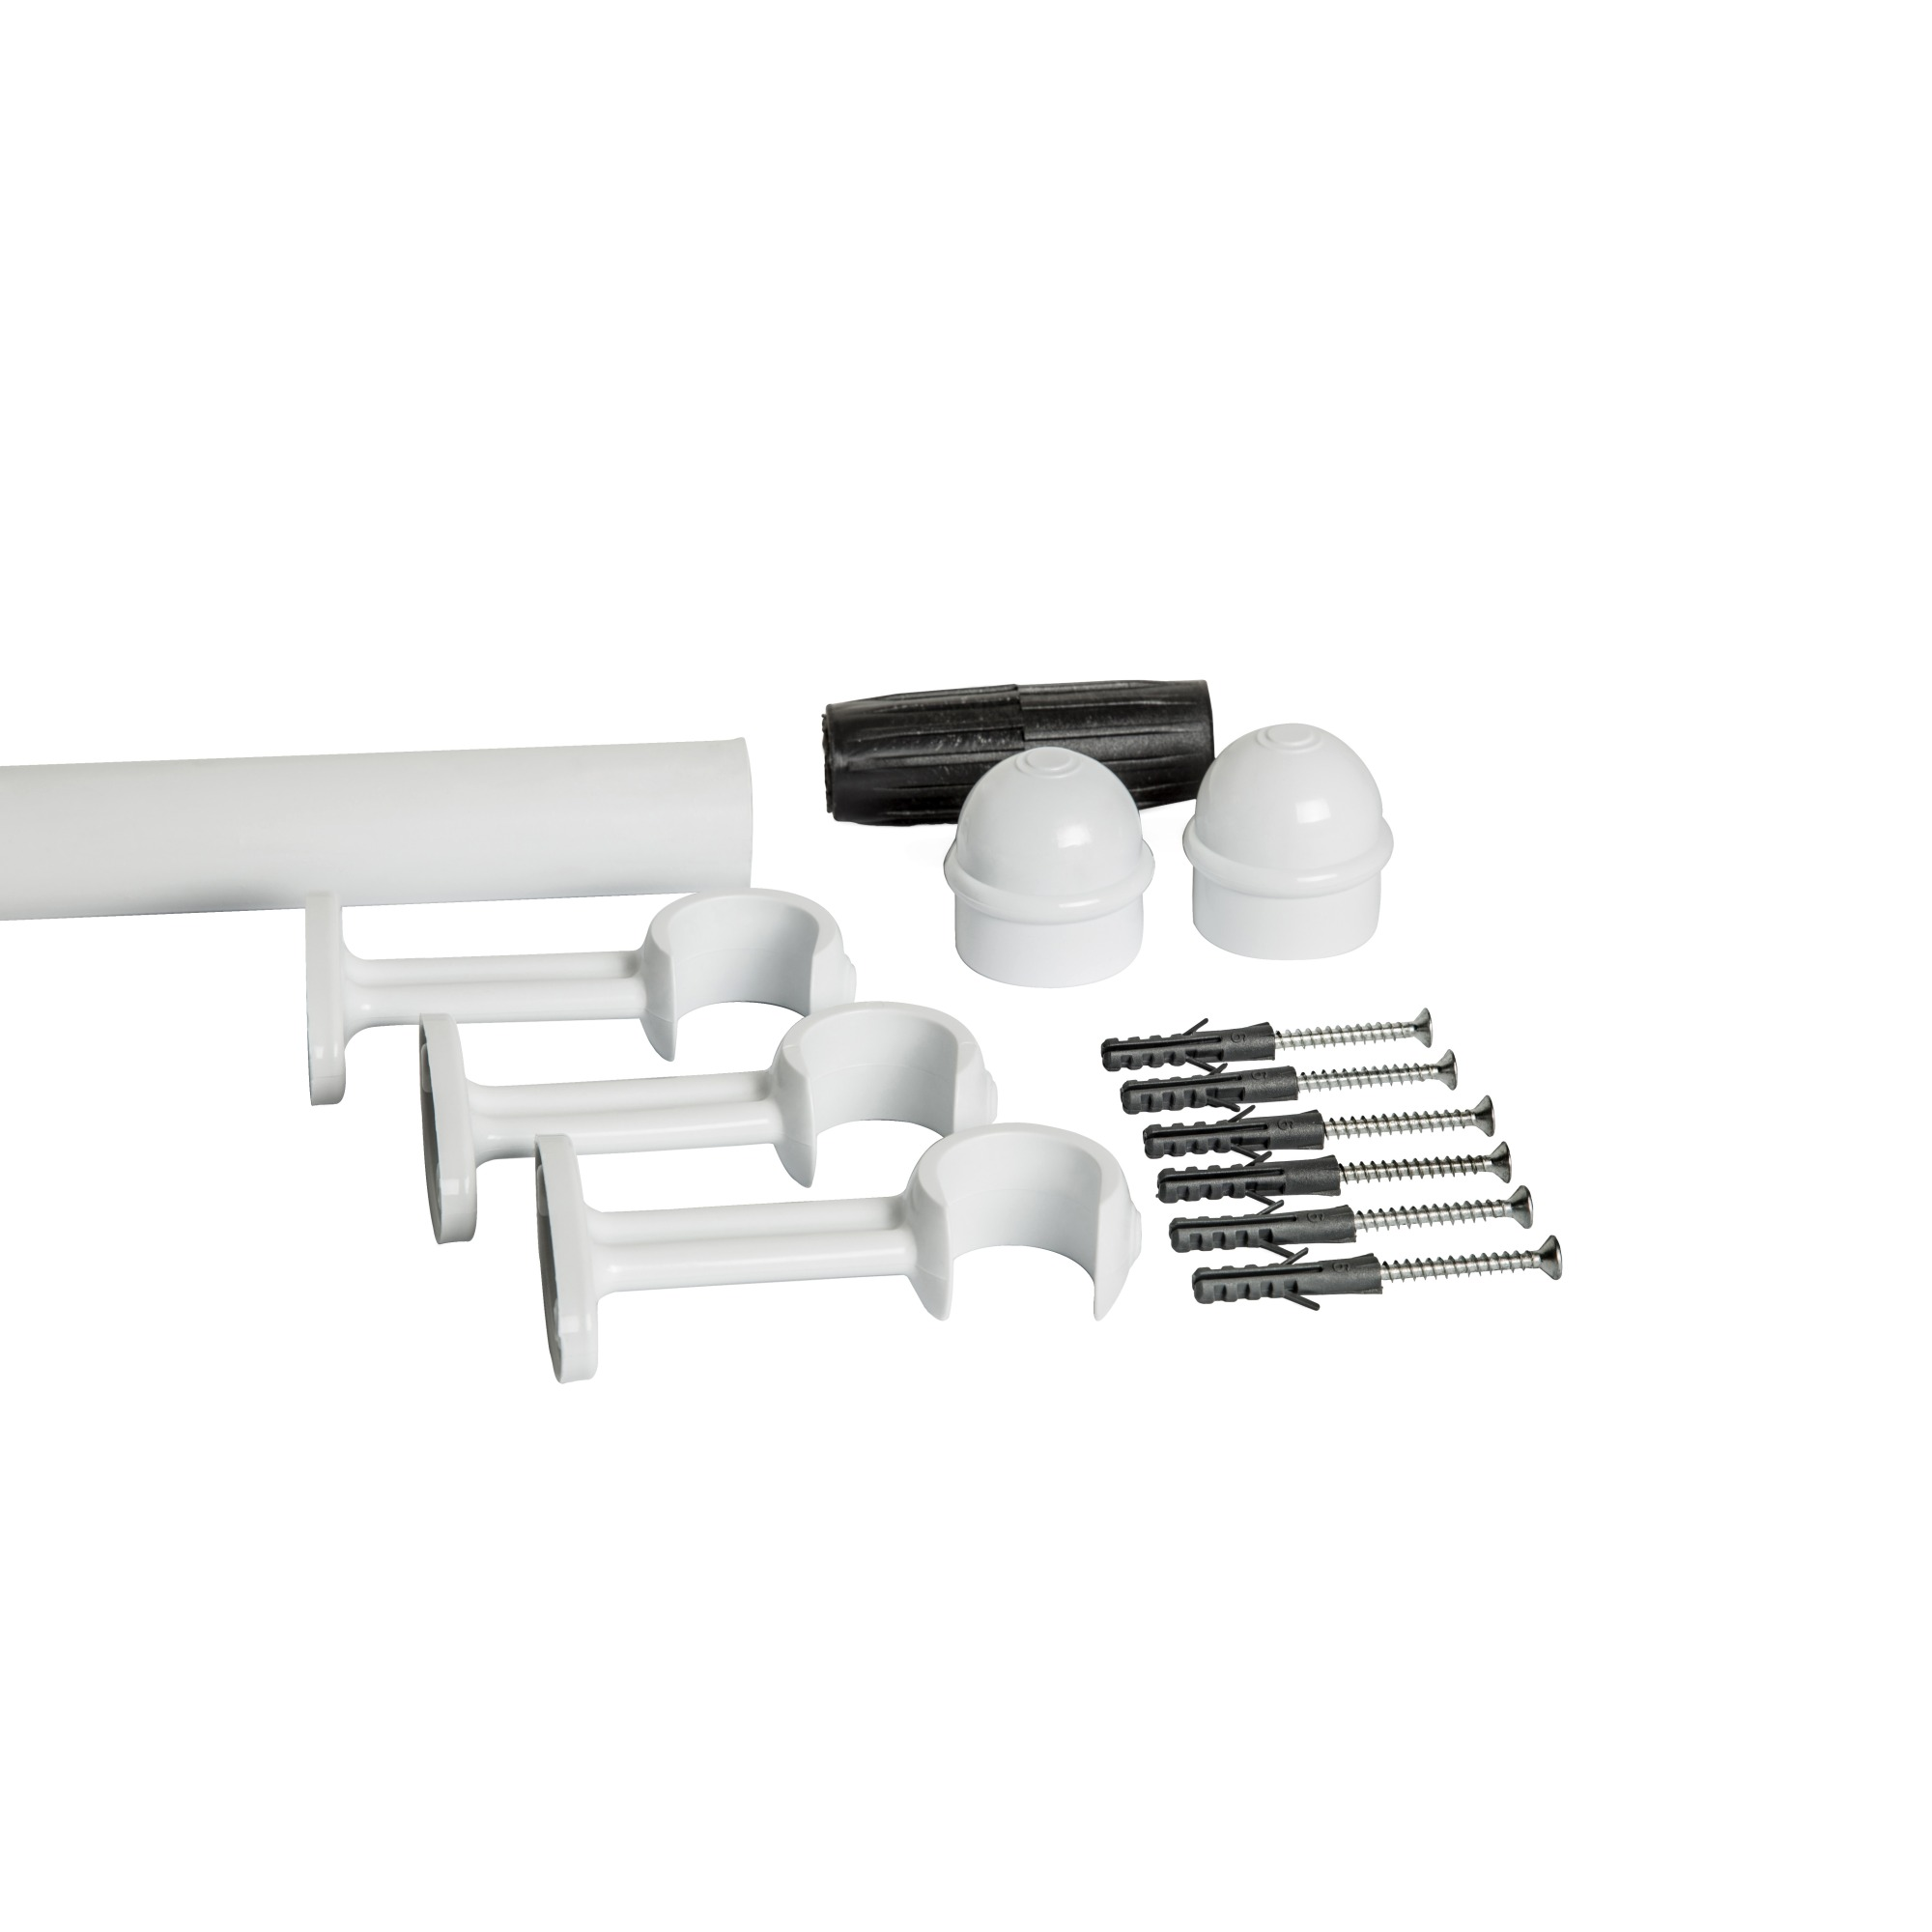 Kit Varao para Cortina 150m x 19mm Clean Branco 482 - STD Home